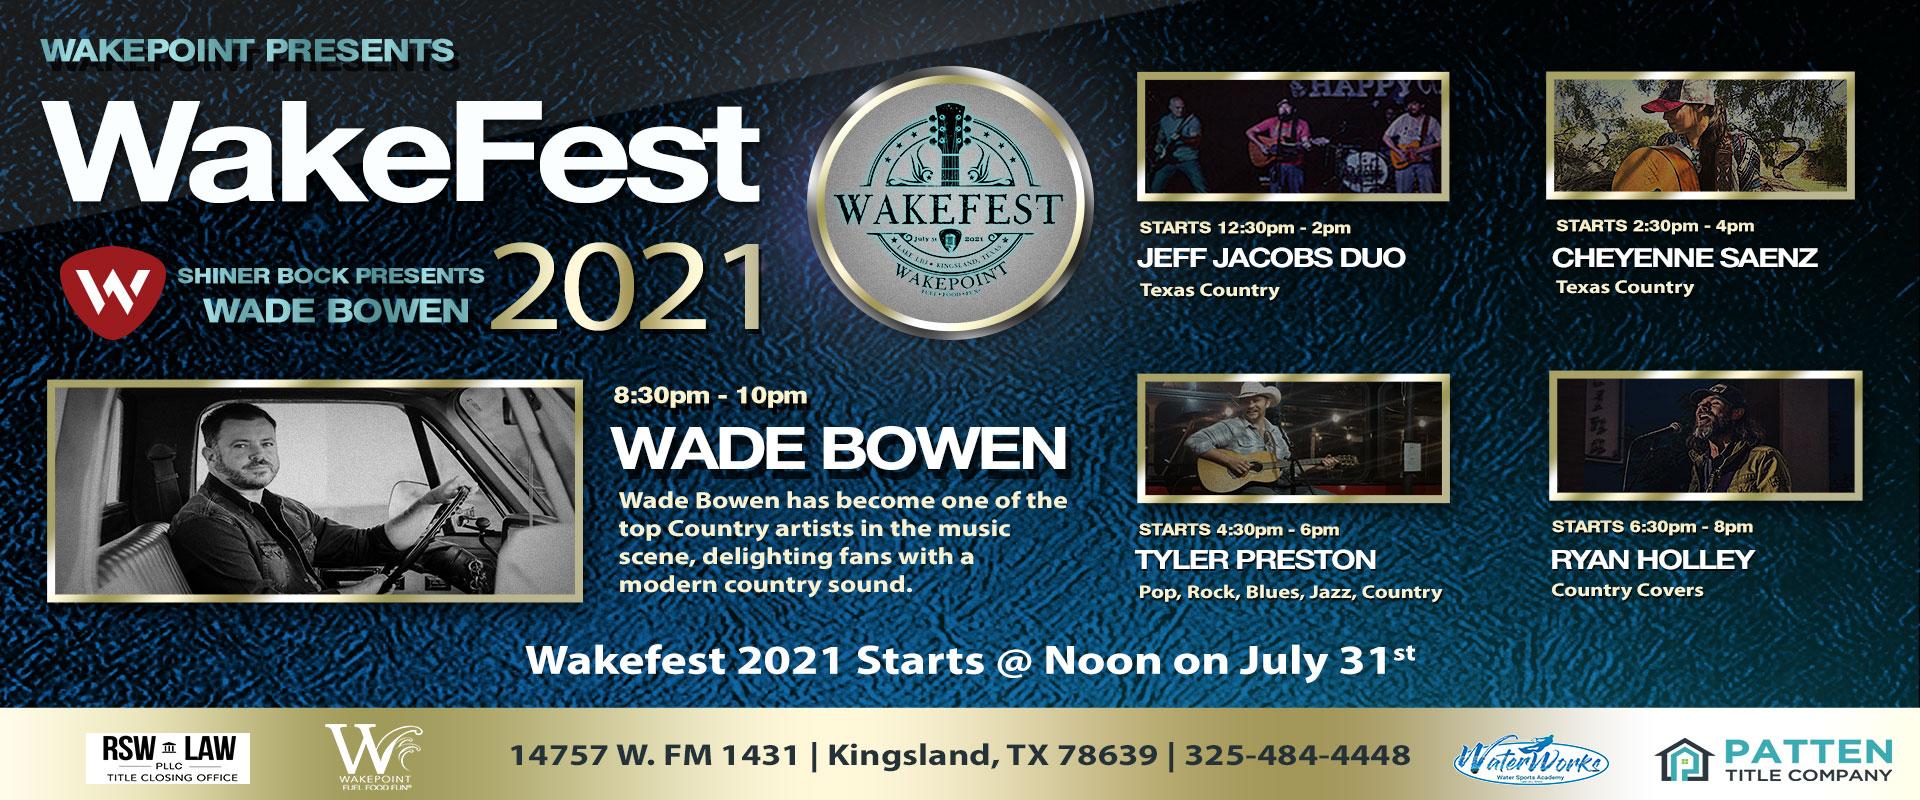 WakeFest 2021